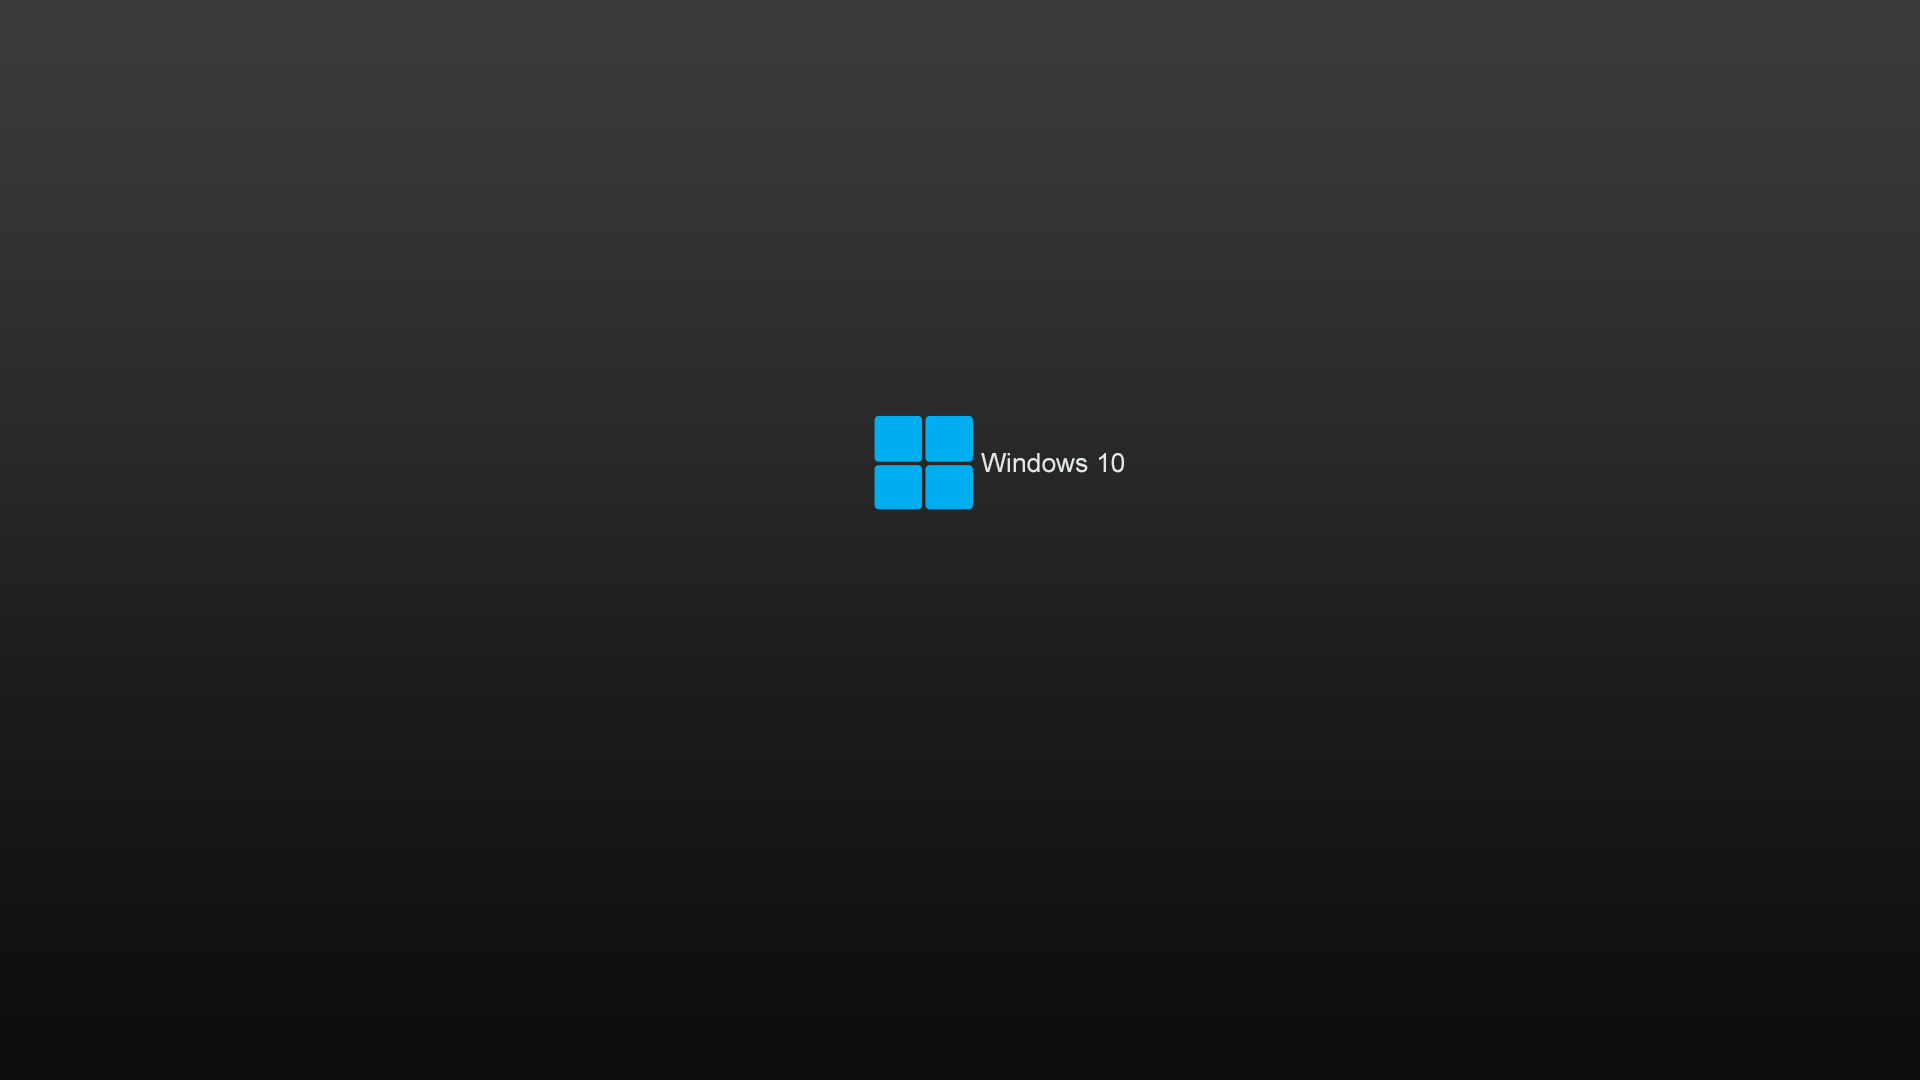 windows 10 desktop is black 19 widescreen wallpaper